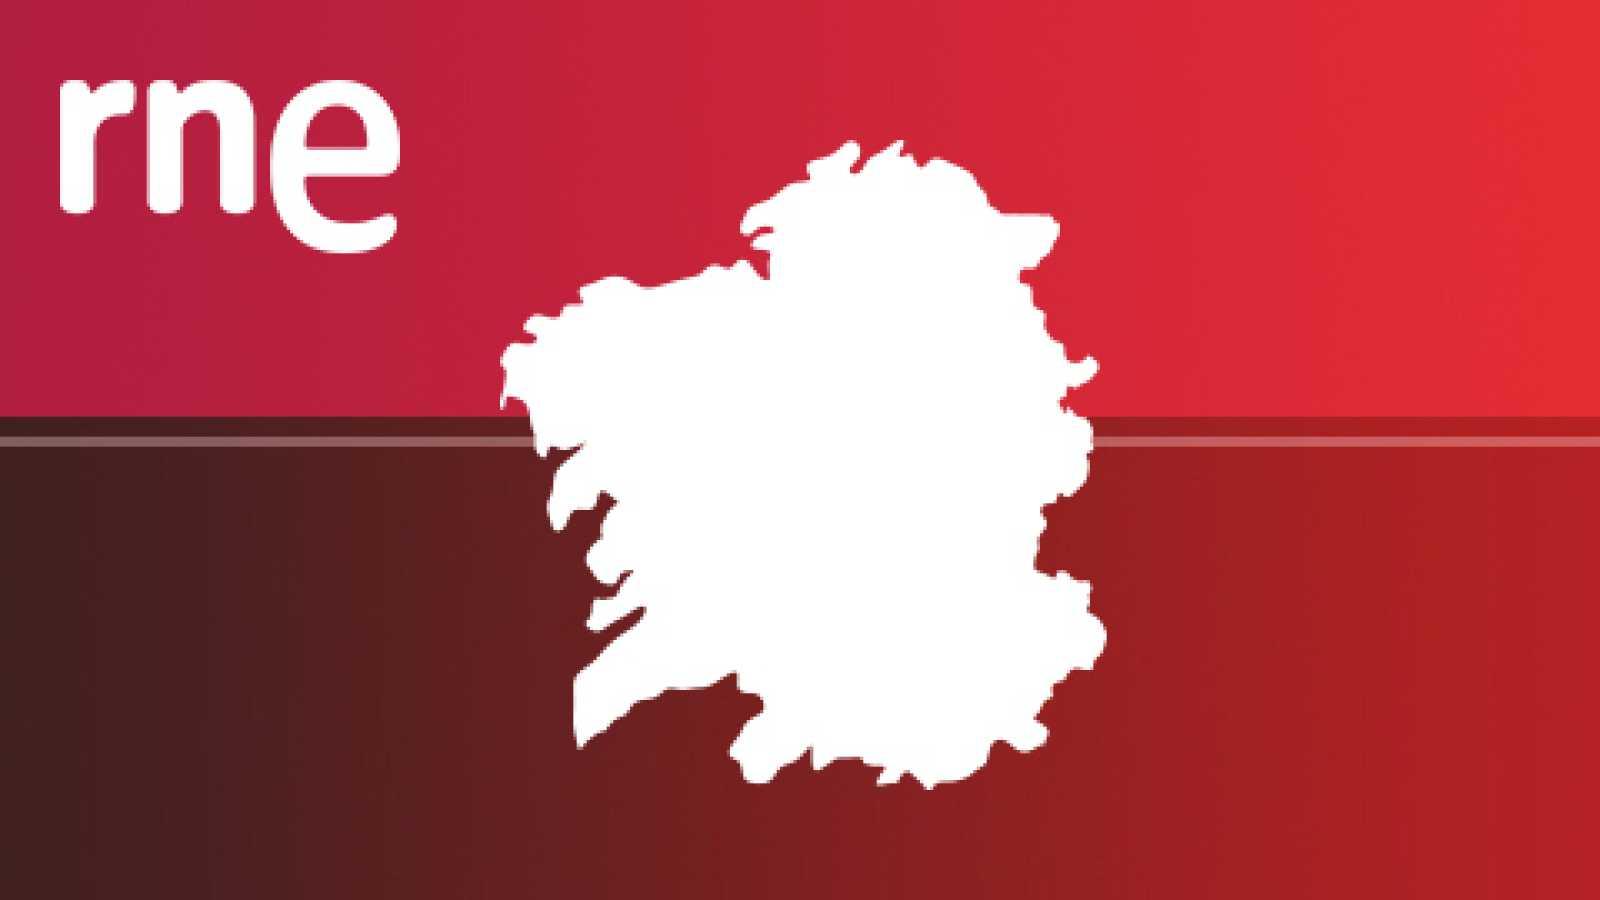 Informativo Galicia 7:45 - 24/09/2020. Escuchar ahora